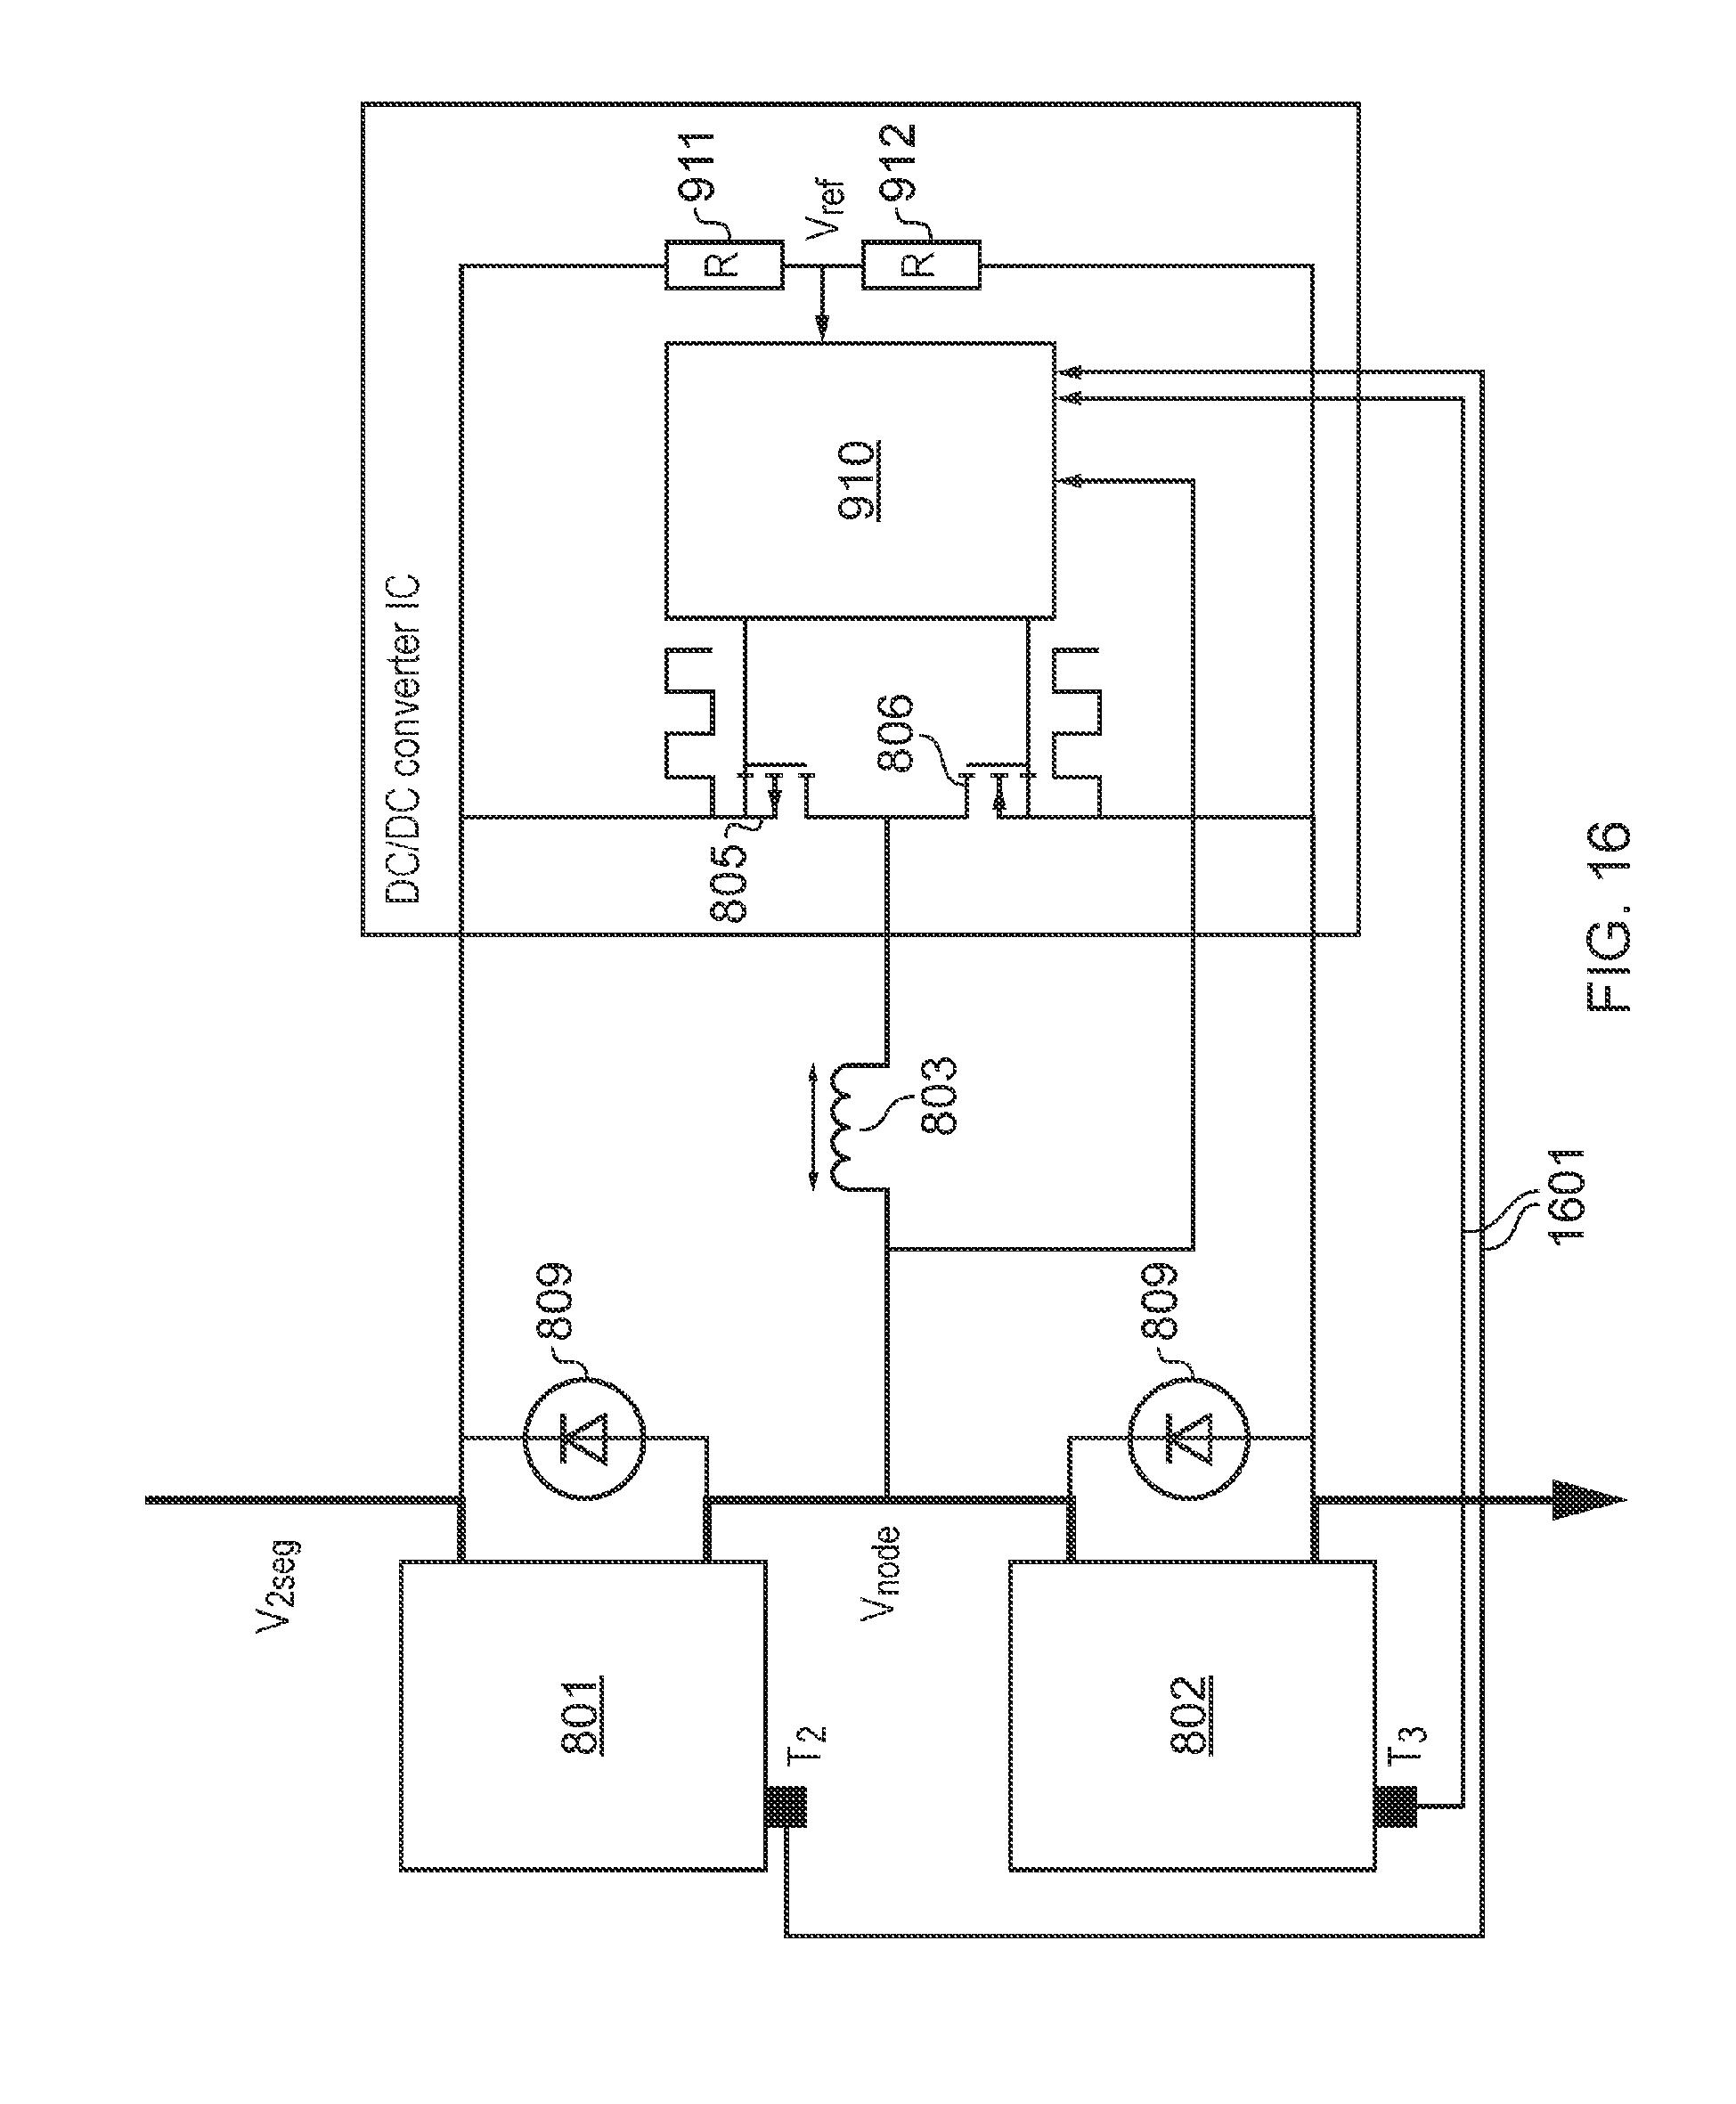 Sure Power Multi Battery Isolator Wiring Diagram Best Secret Boat Instruction